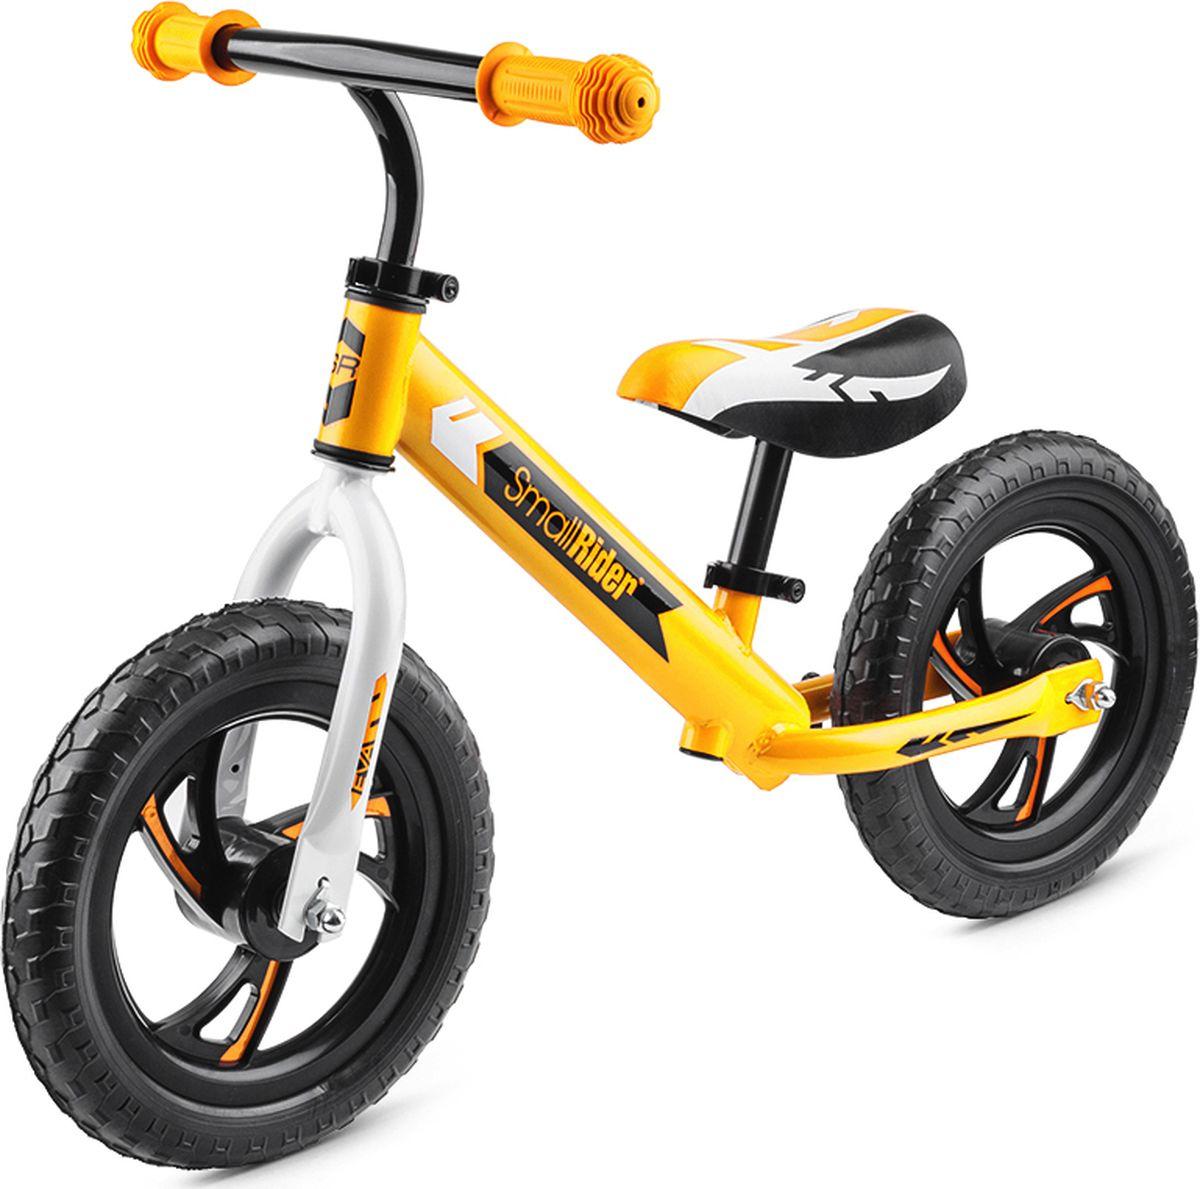 Small Rider Беговел детский Roadster Eva цвет желтый беговел bradex беговел с колесом в виде мяча велоболл